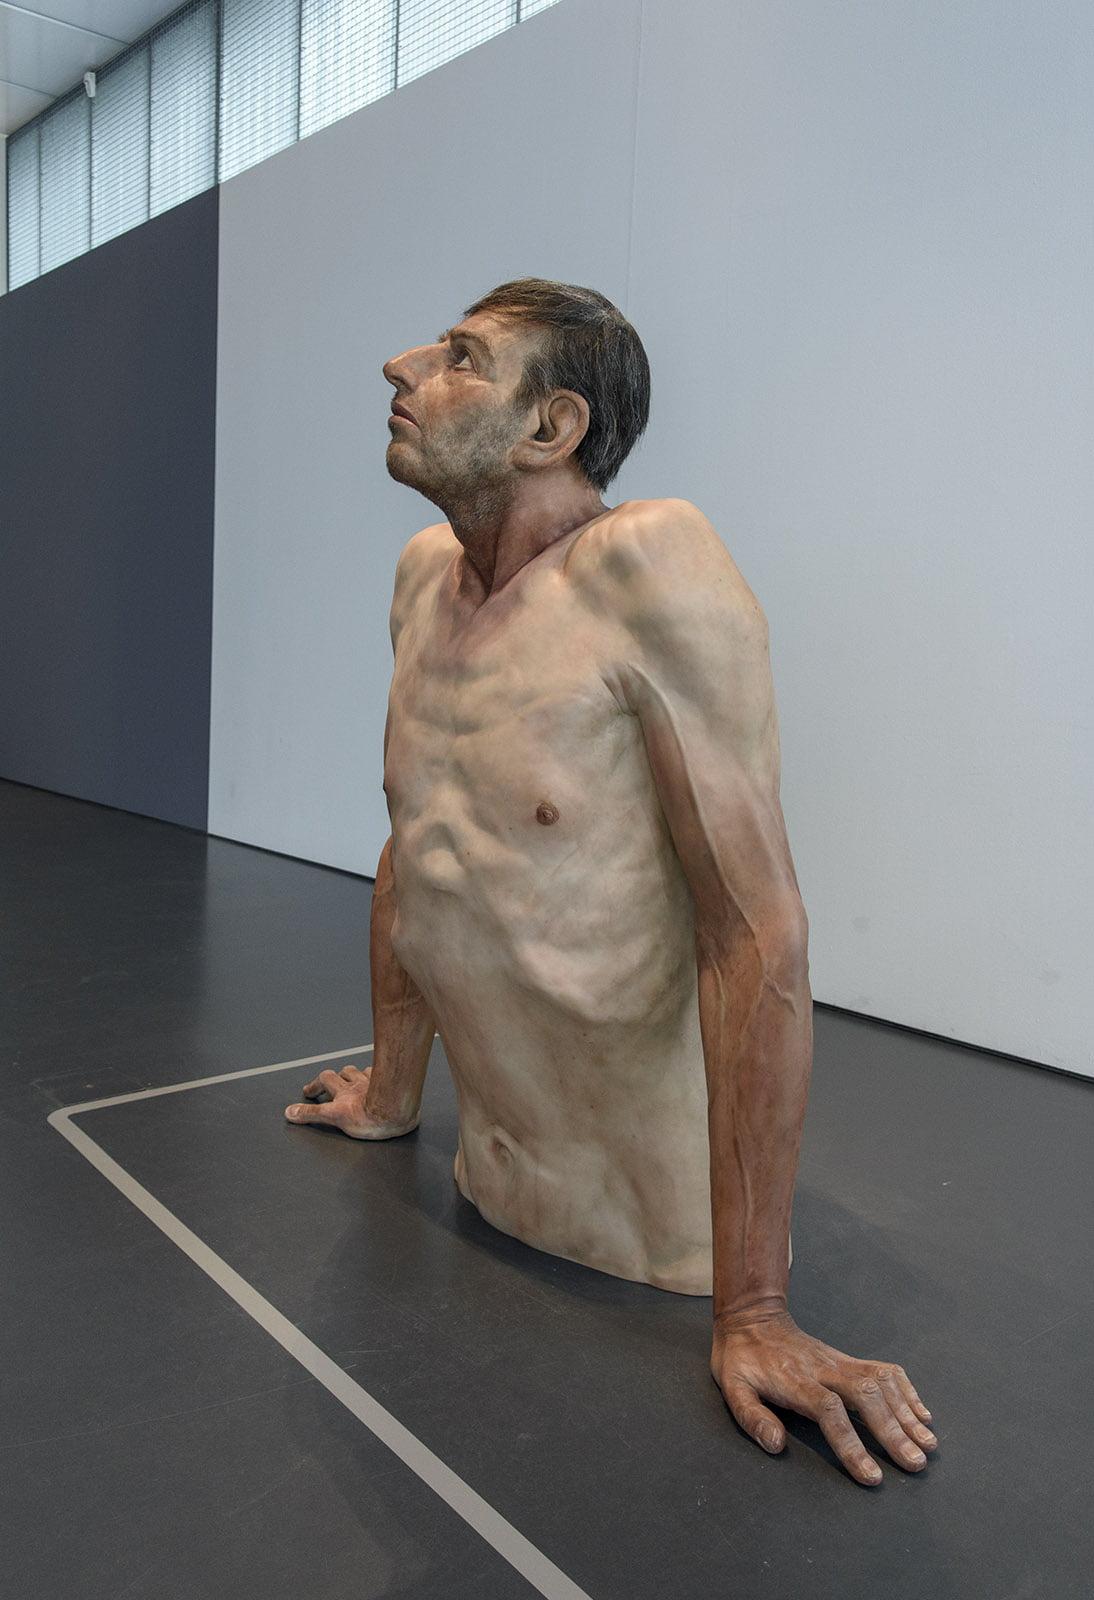 Zharko Basheski - Ordinary Man, Kunsthal, Hyperrealism Sculpture